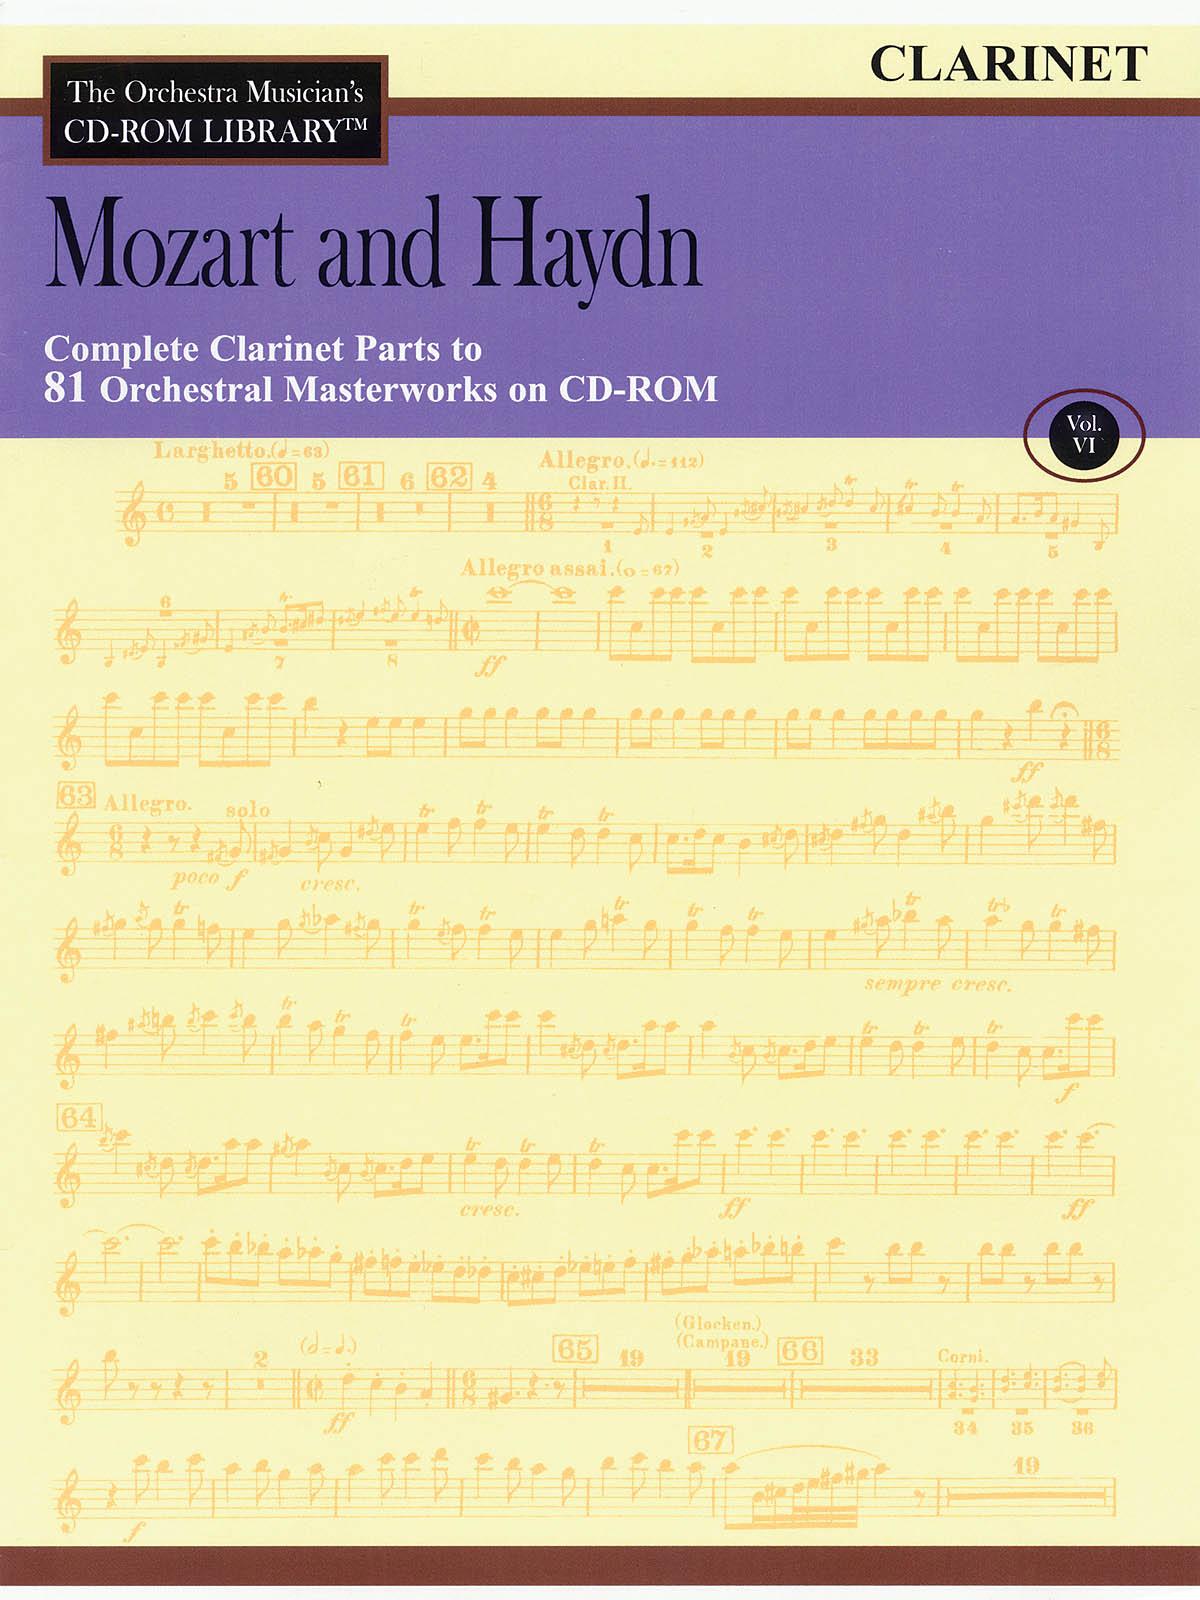 Franz Joseph Haydn Wolfgang Amadeus Mozart: Mozart and Haydn - Volume 6: